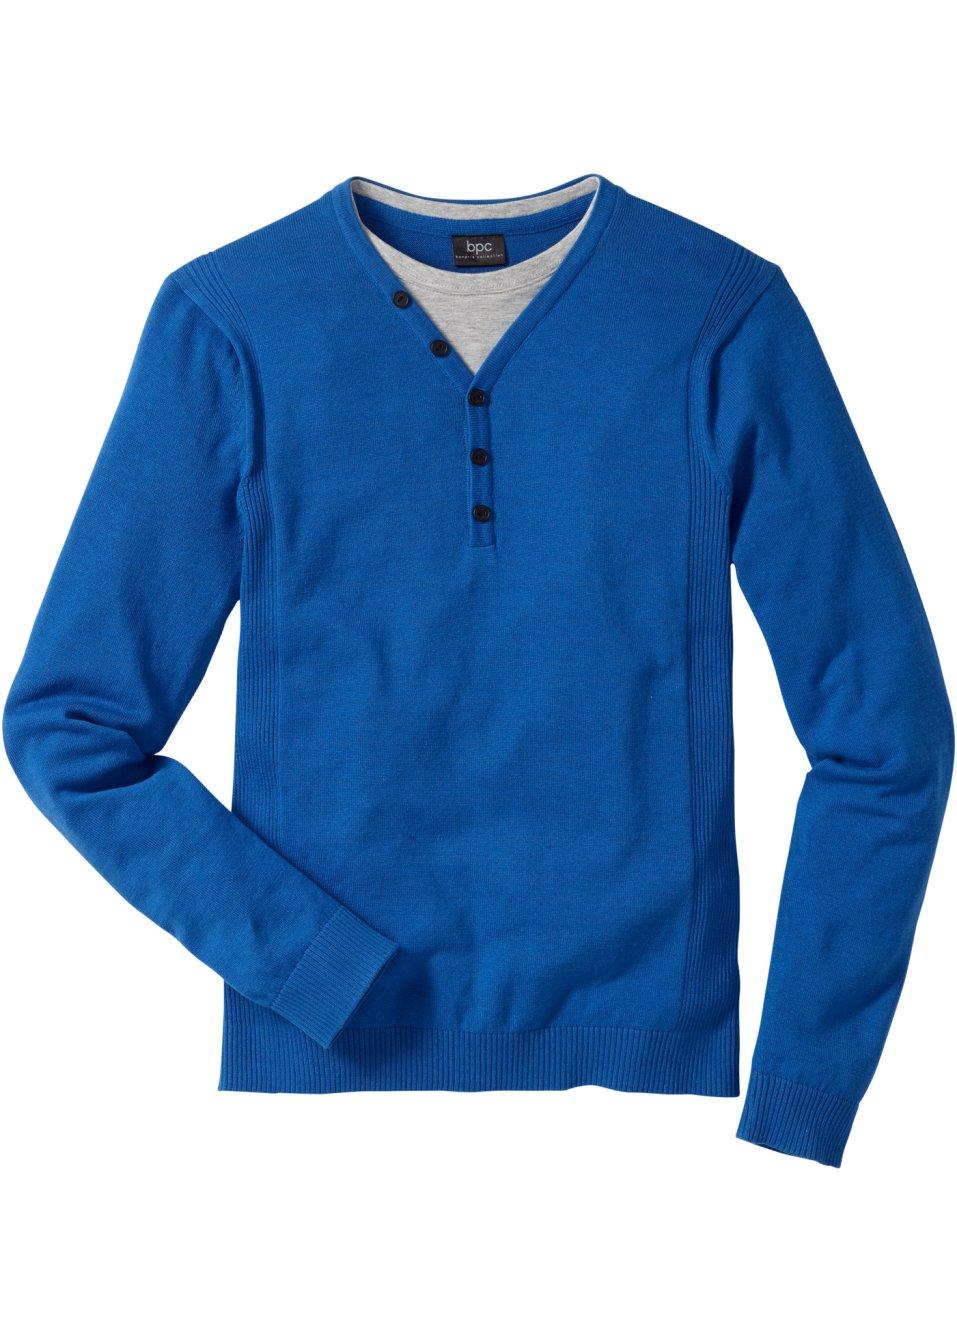 pull style 2en1 regular fit bleu azur bpc bonprix. Black Bedroom Furniture Sets. Home Design Ideas